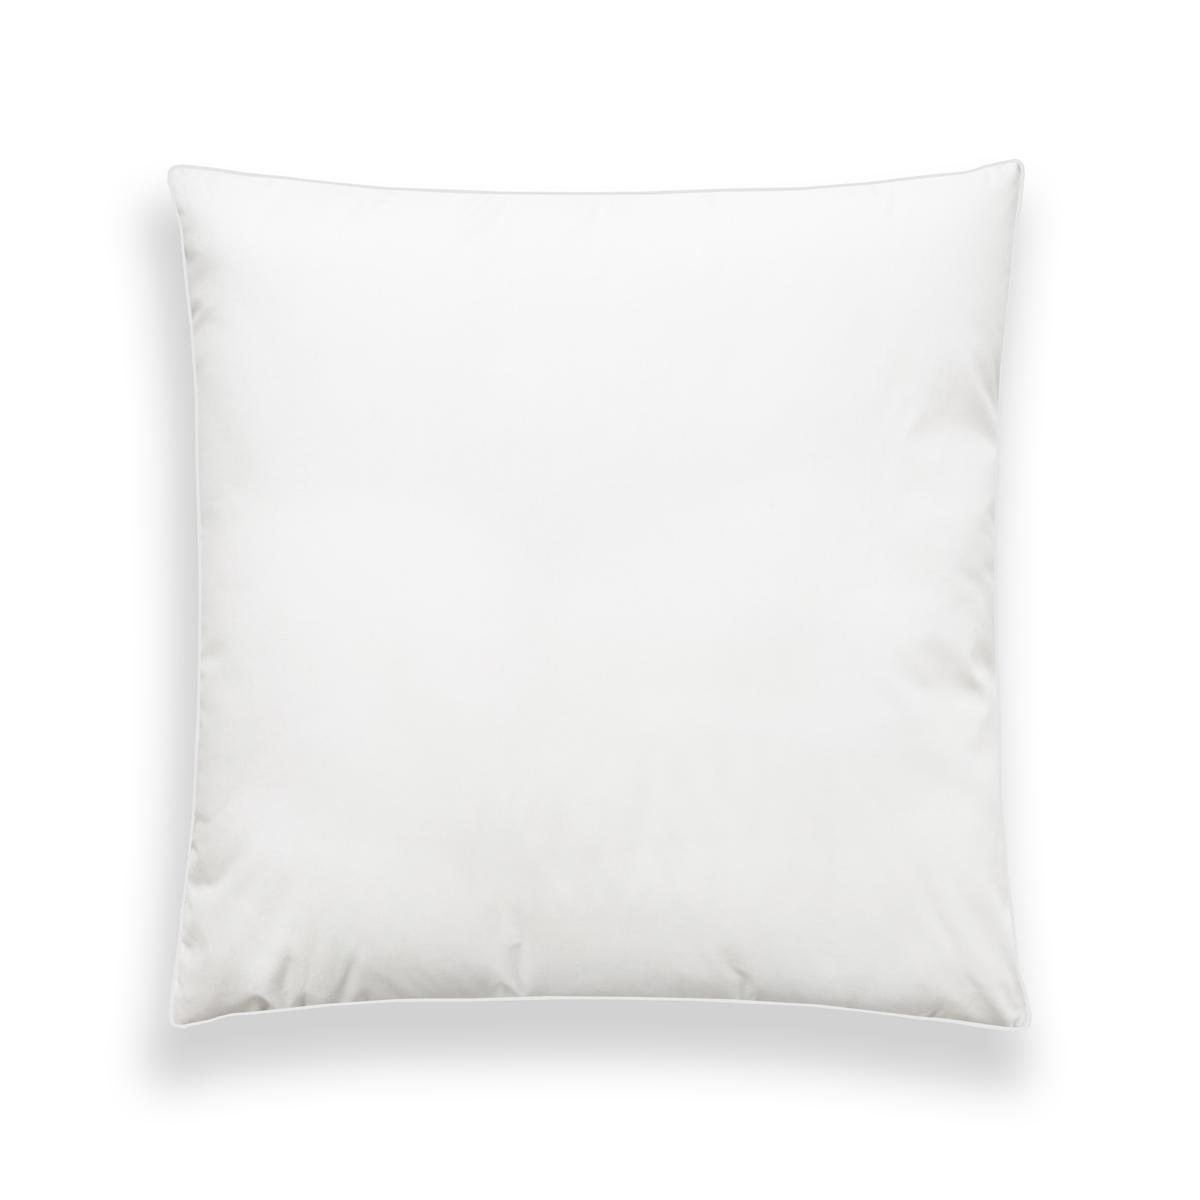 Oreiller FERME 10% Duvet Anti-acariens - Coton Bio  65x65 cm